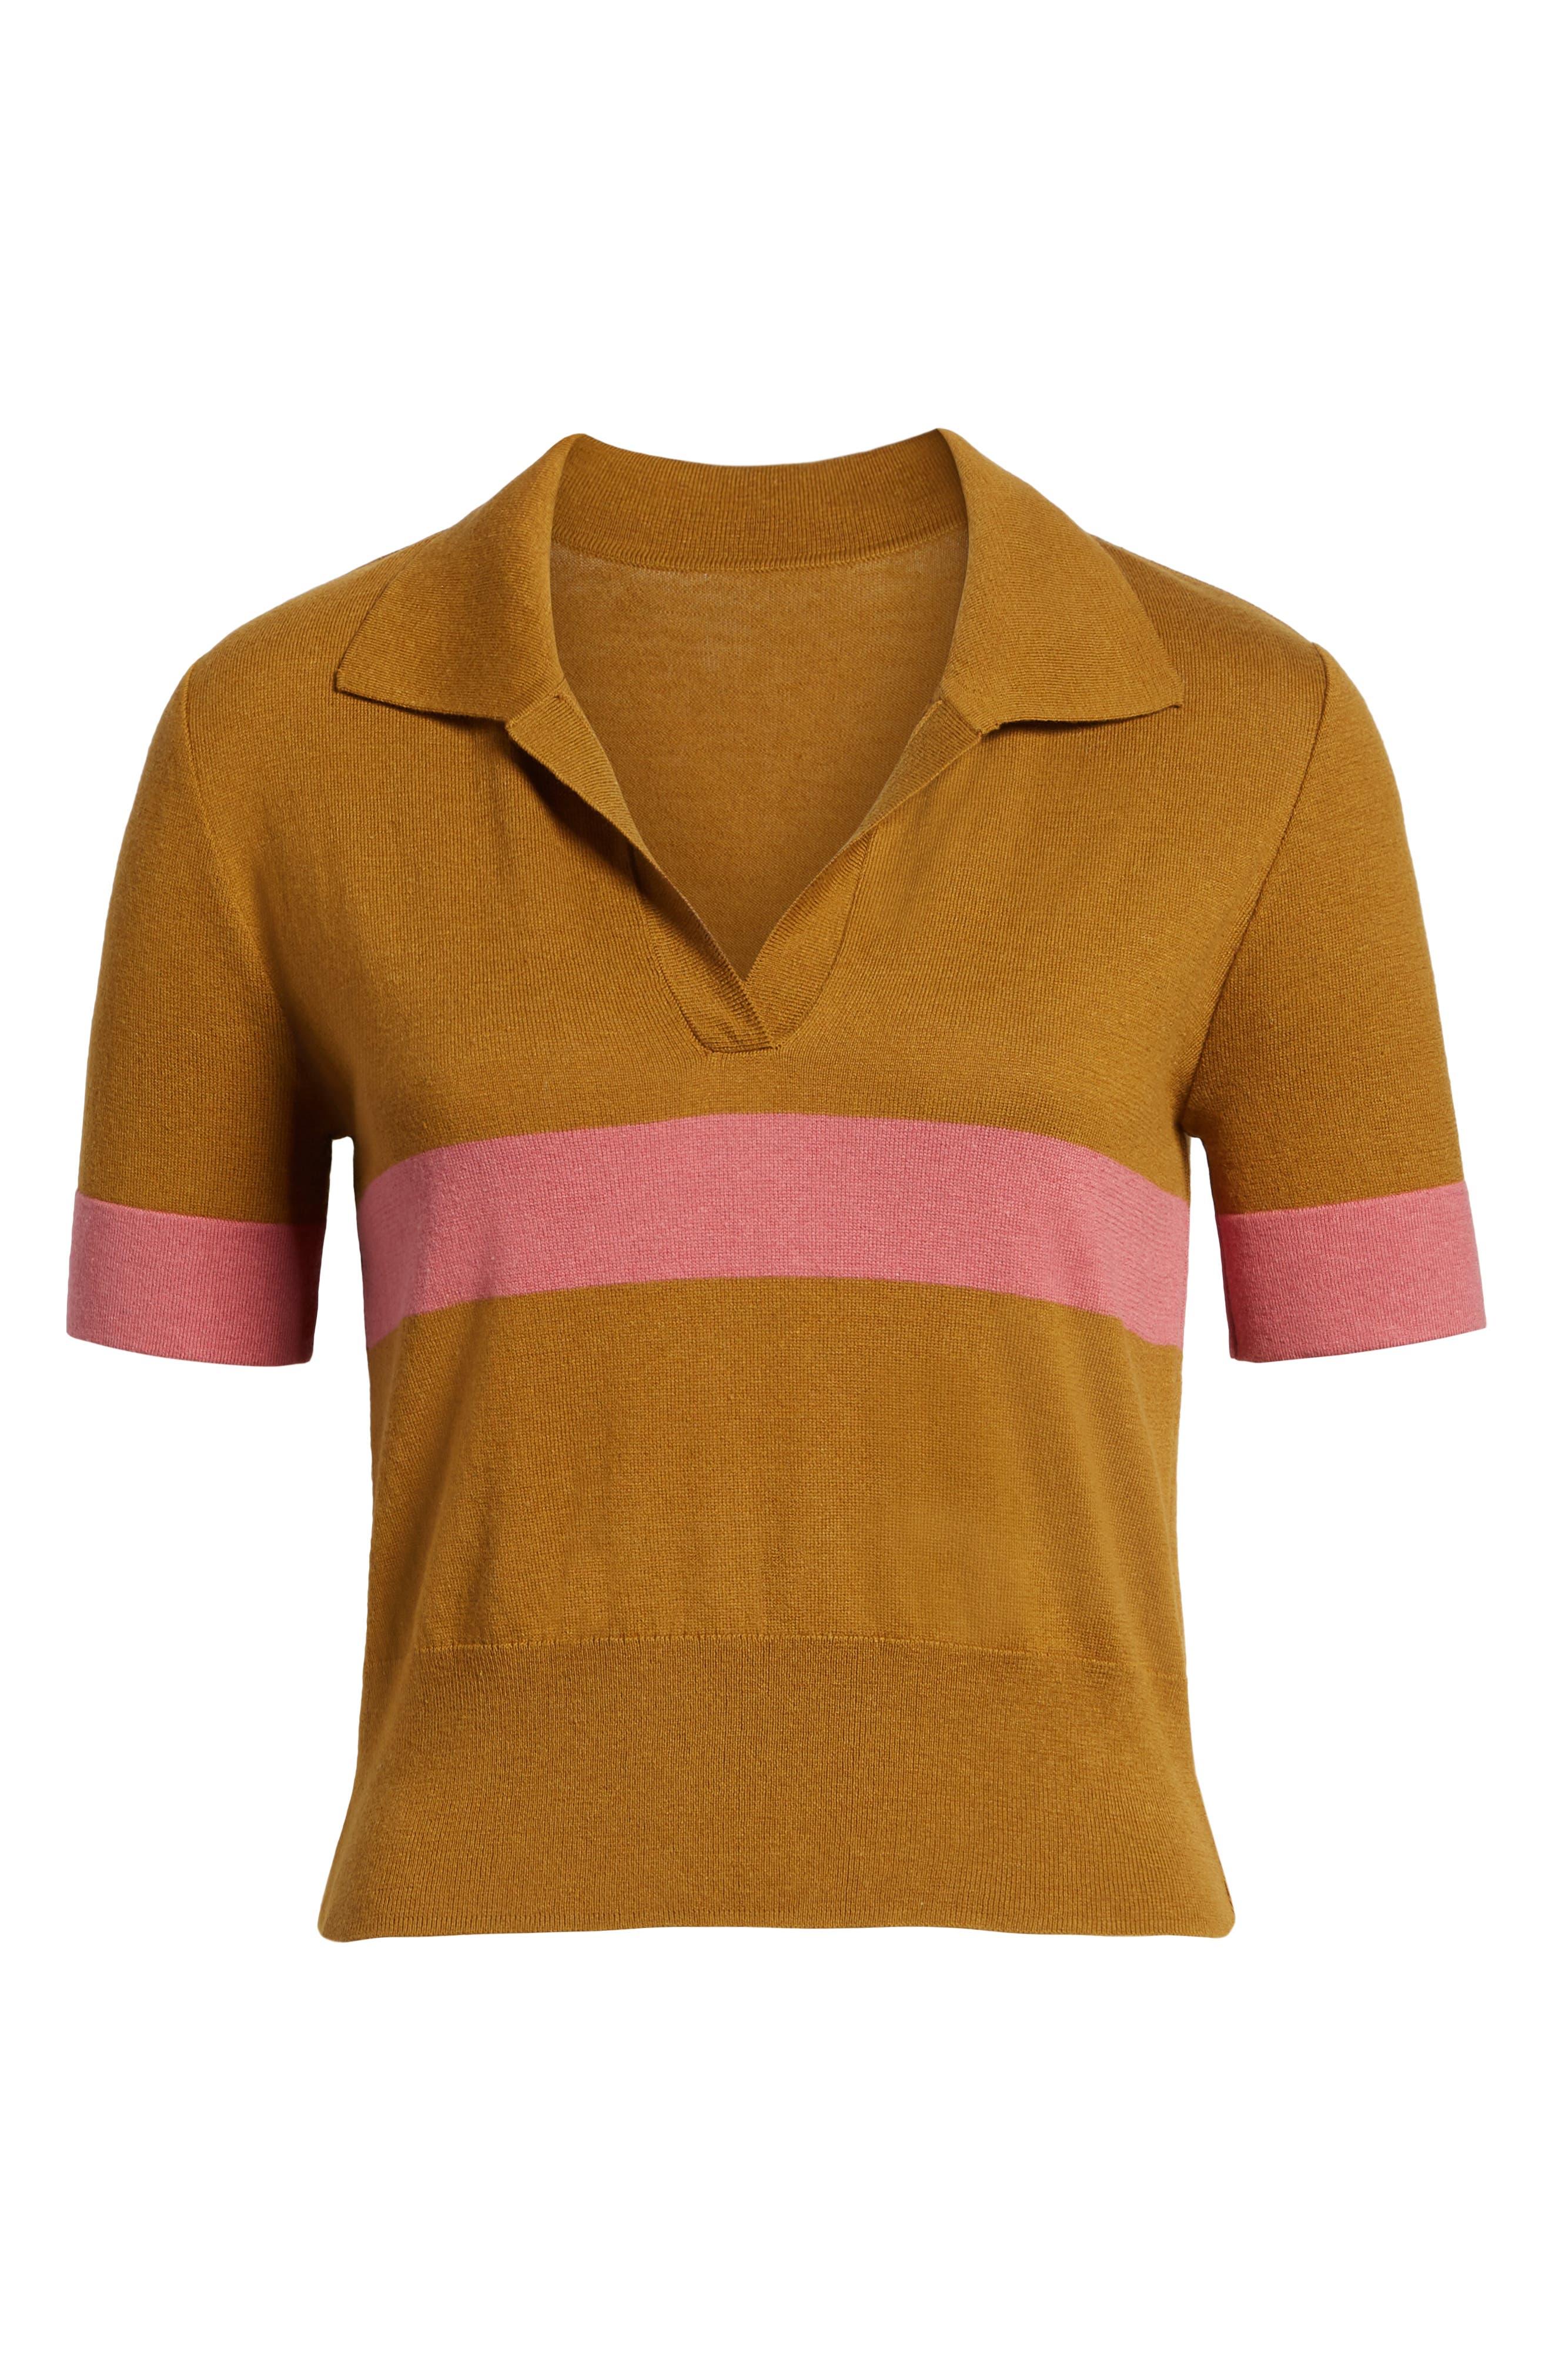 BP., Stripe Polo Sweater, Alternate thumbnail 6, color, BROWN BRONZE AIME STRIPE